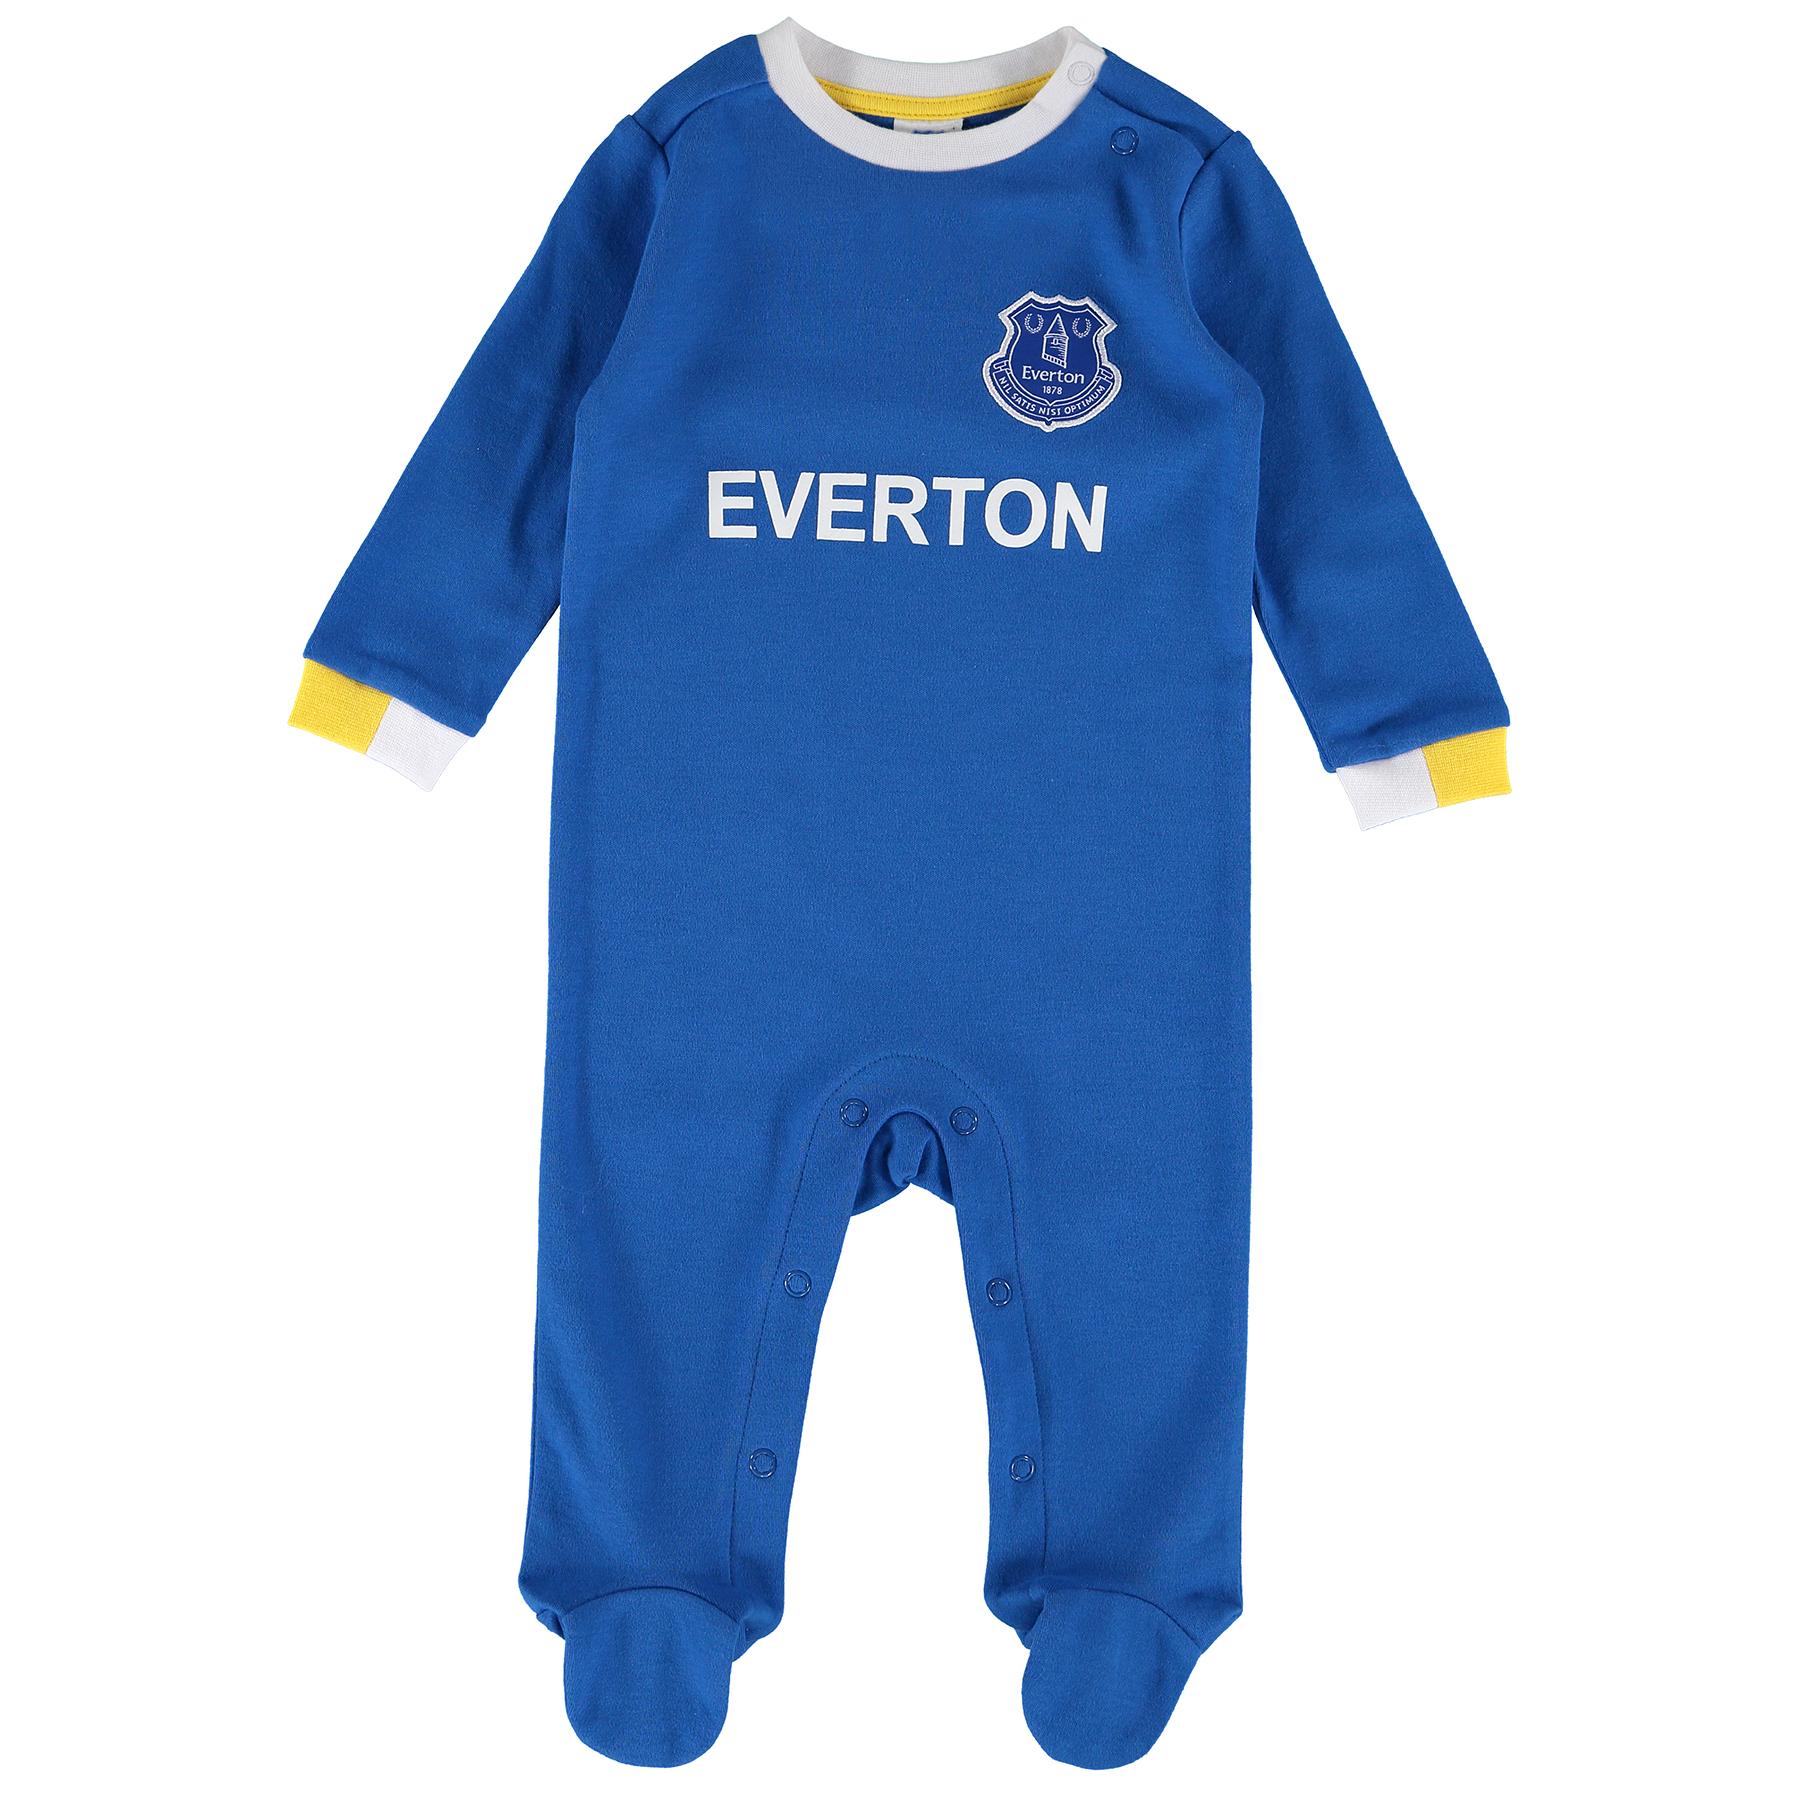 Everton Sleepsuit - Royal - Baby